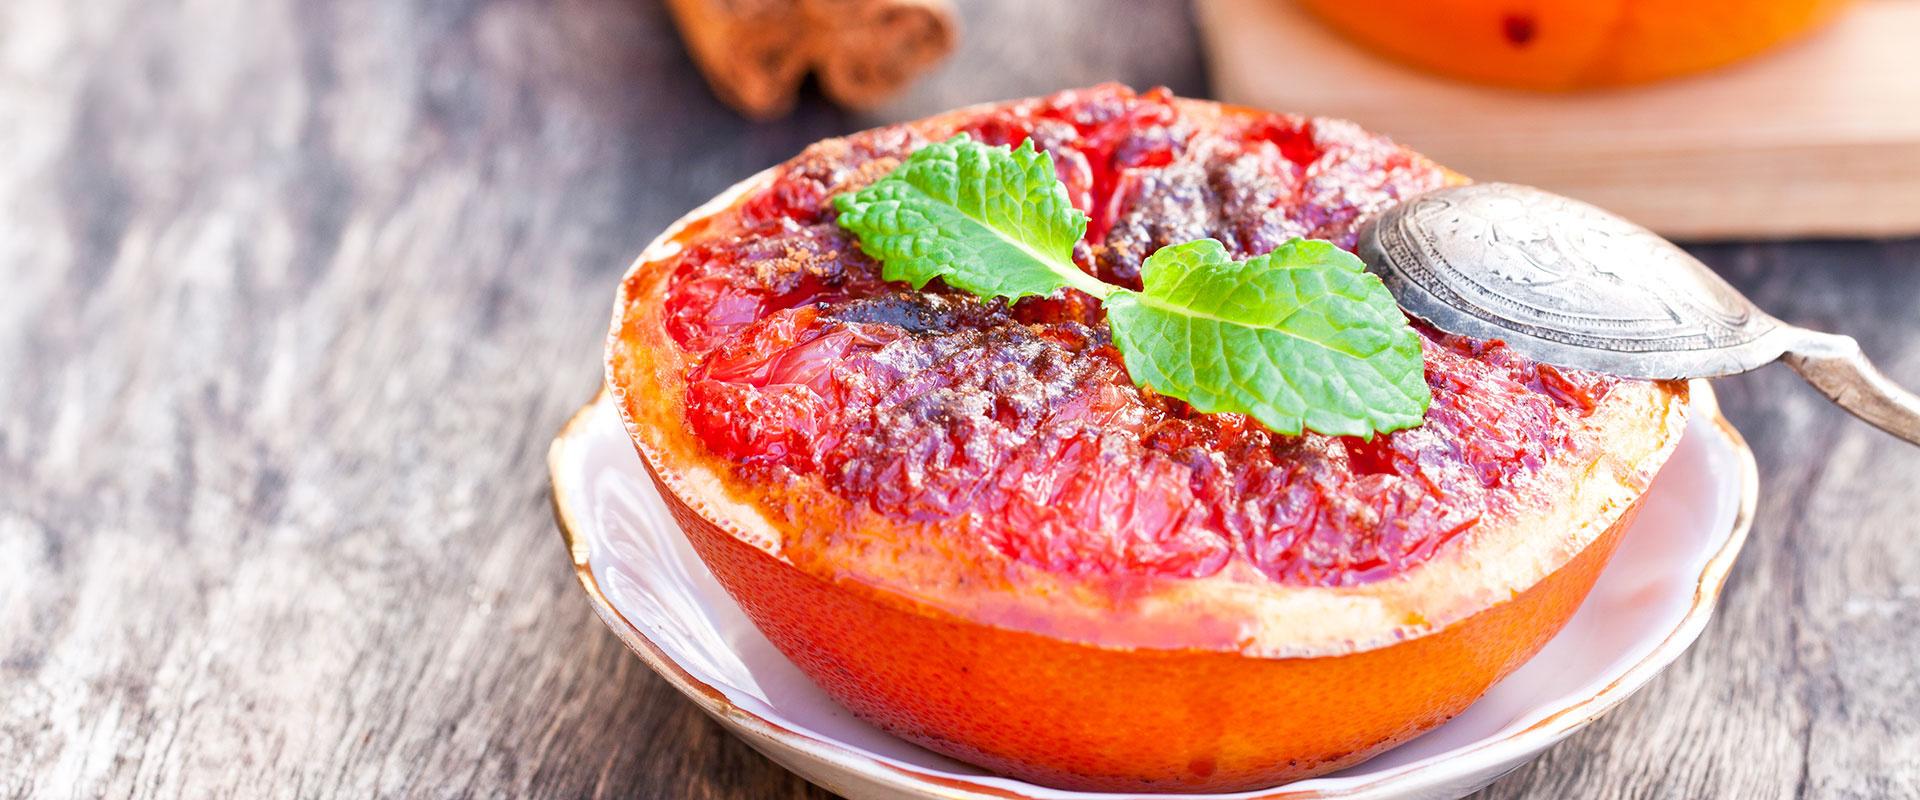 grillezettgrapefruit